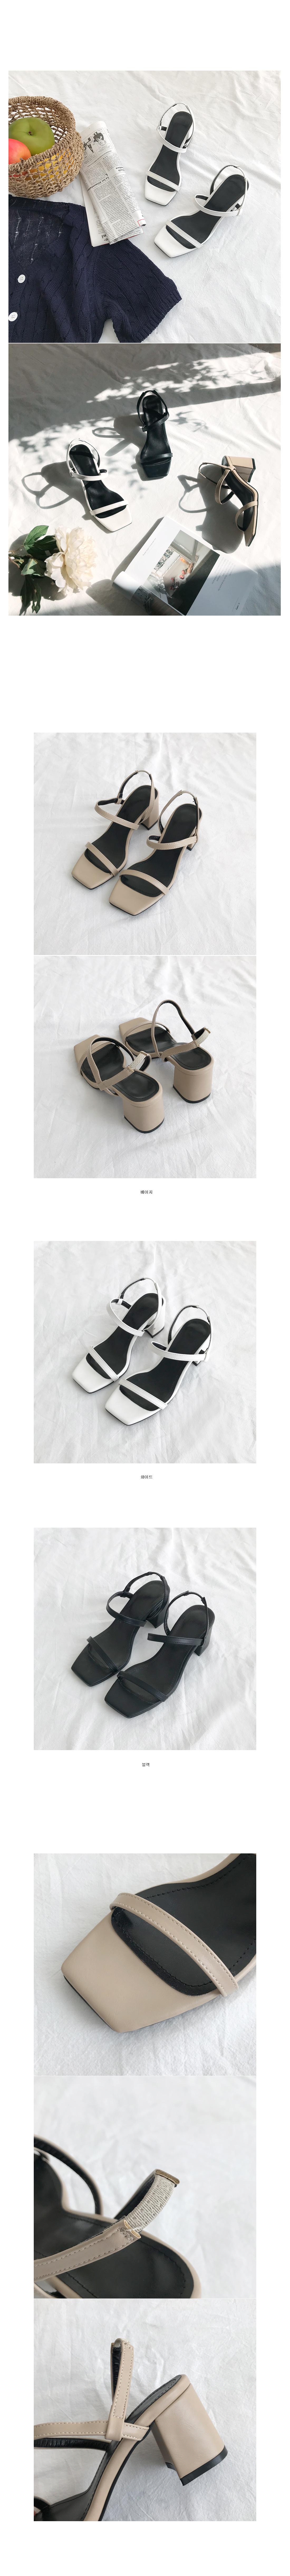 Holic Strap Sandal Heels - White 245, Beige 225